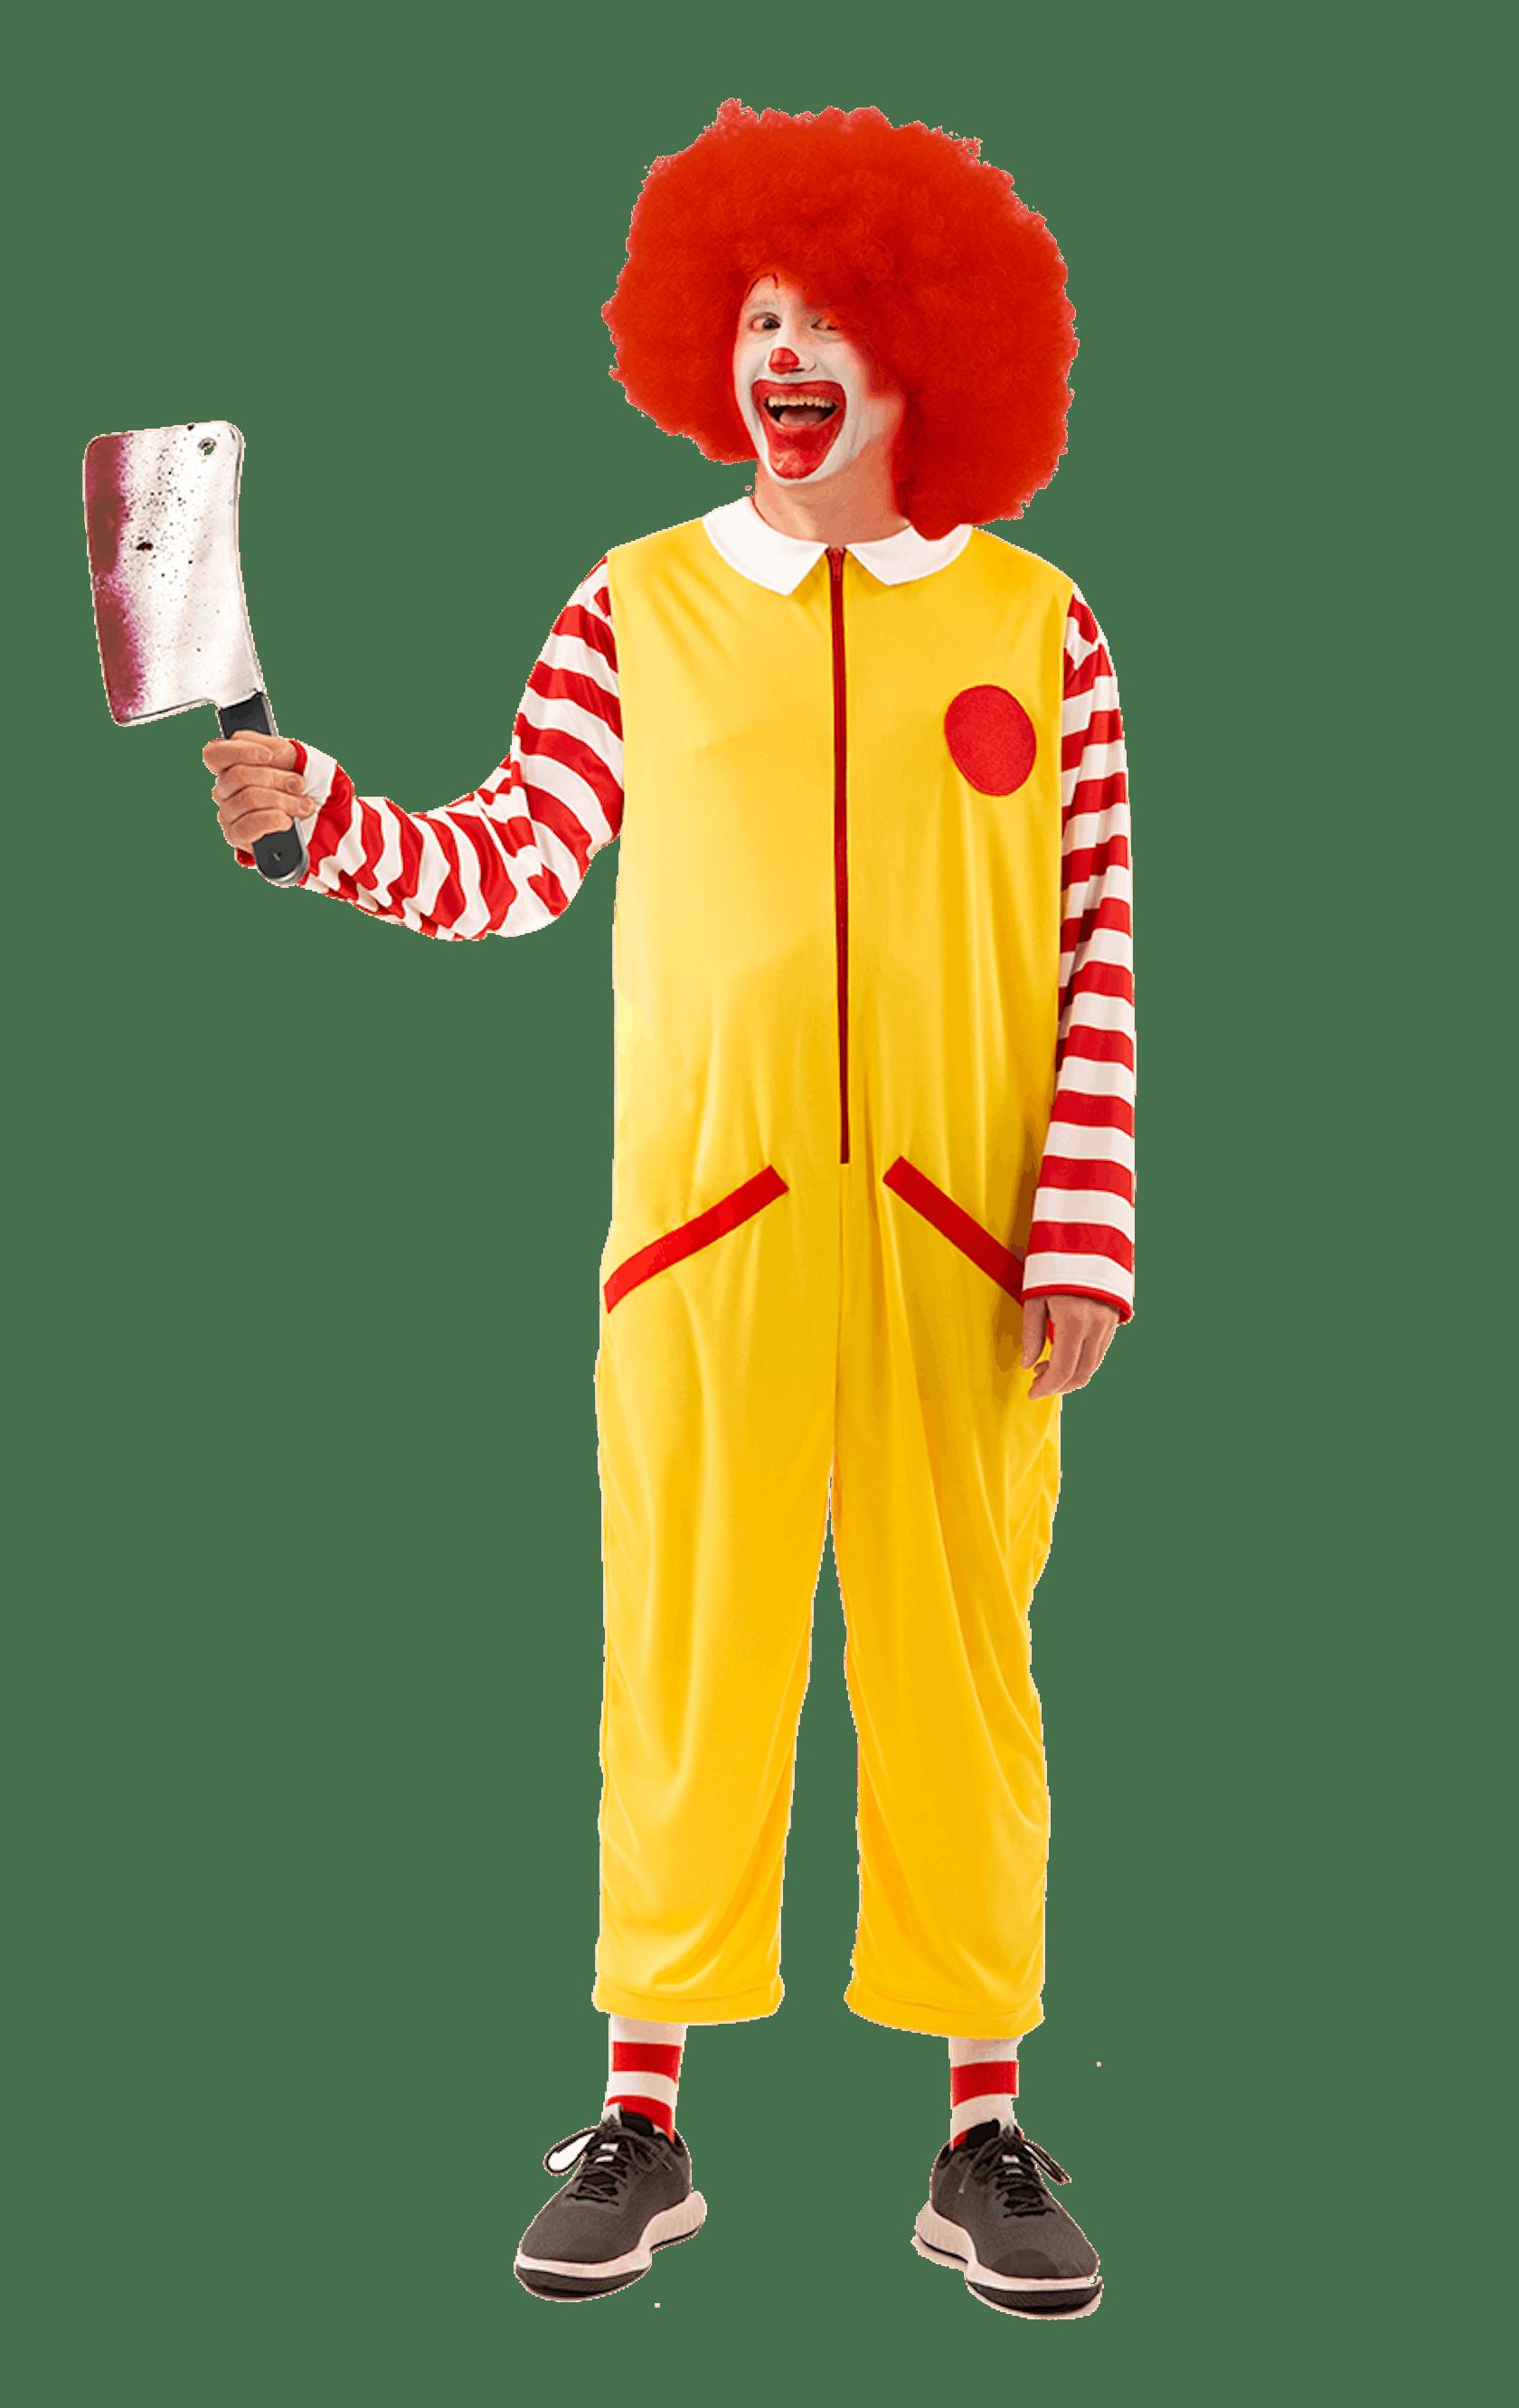 Ronald Clown Costume